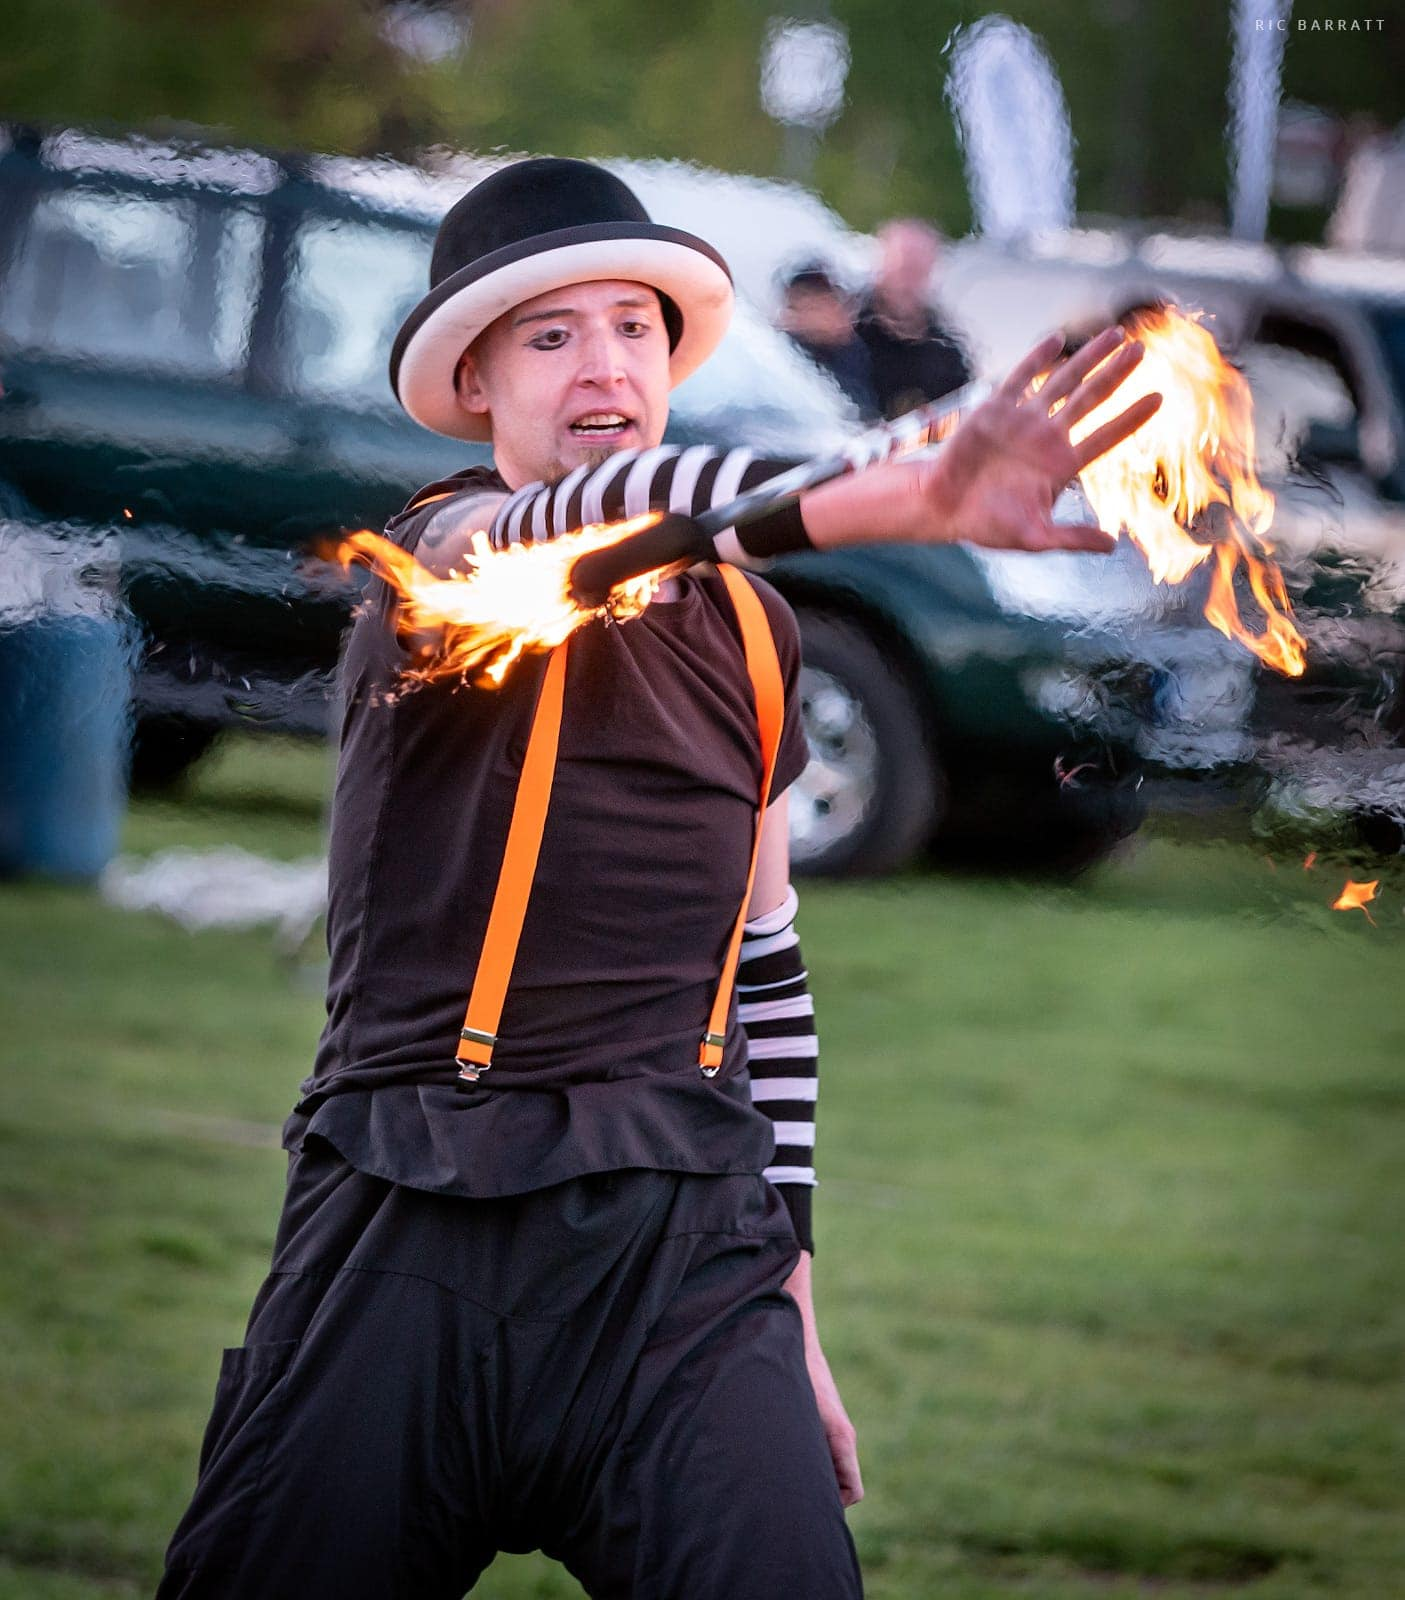 Circus perform twirls a flaming baton around his arm.